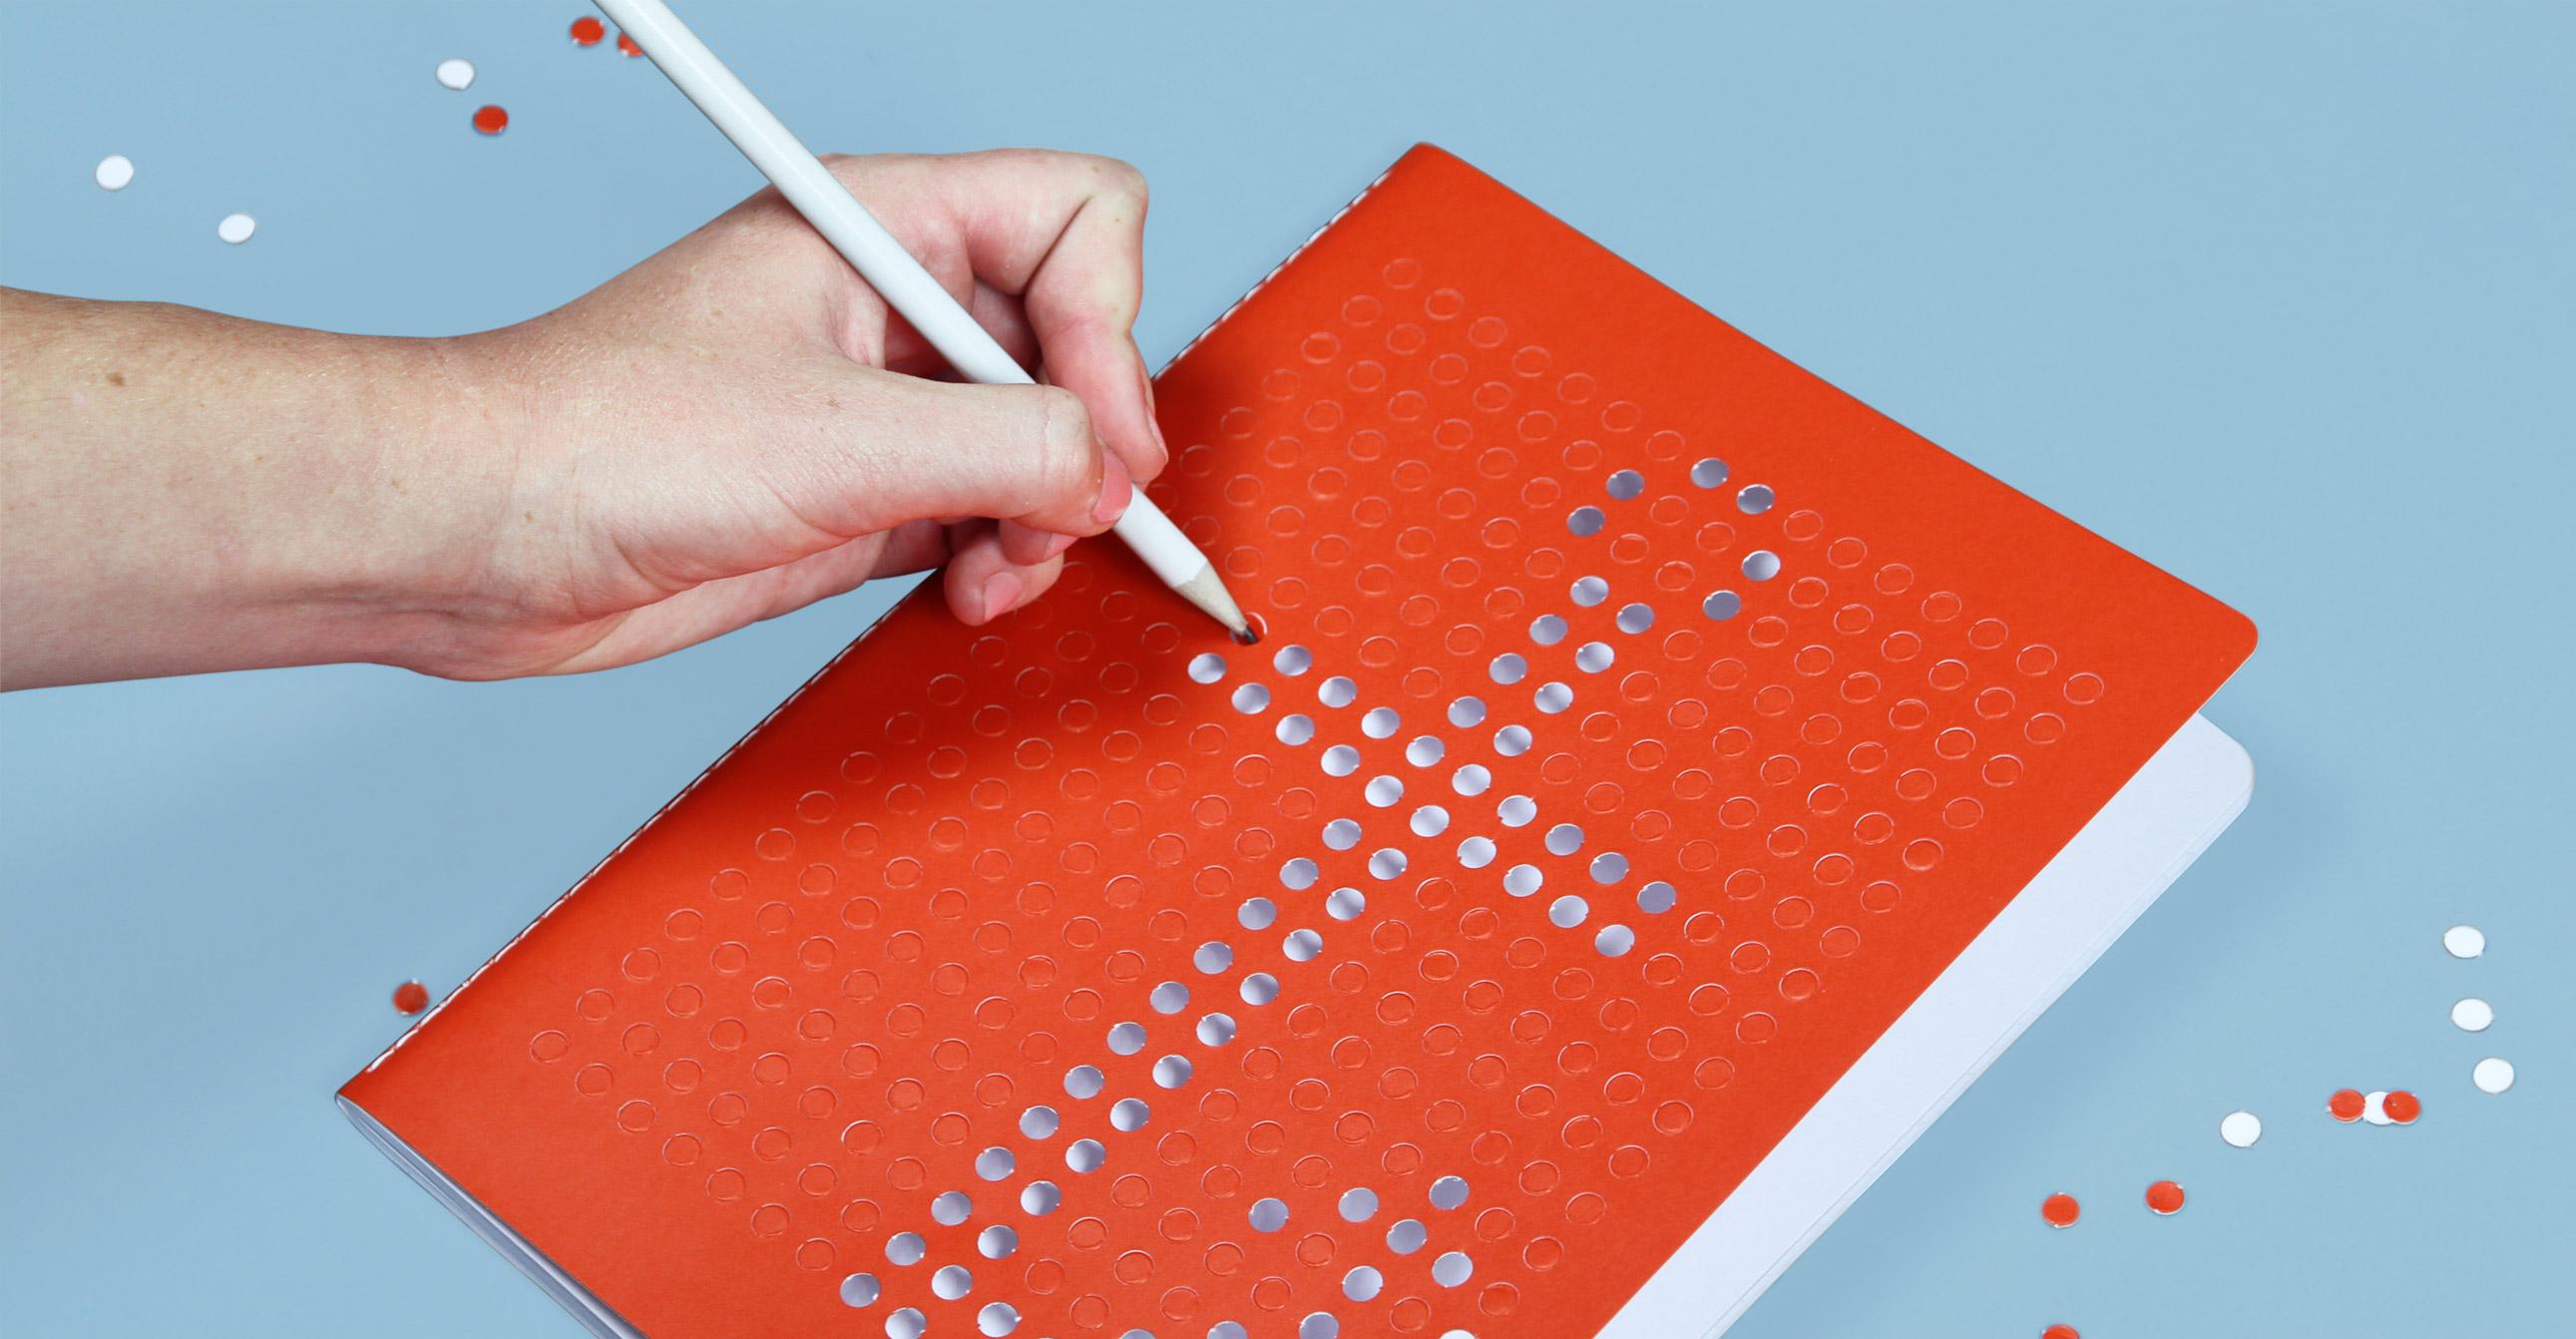 foundry-notebook-06.jpg